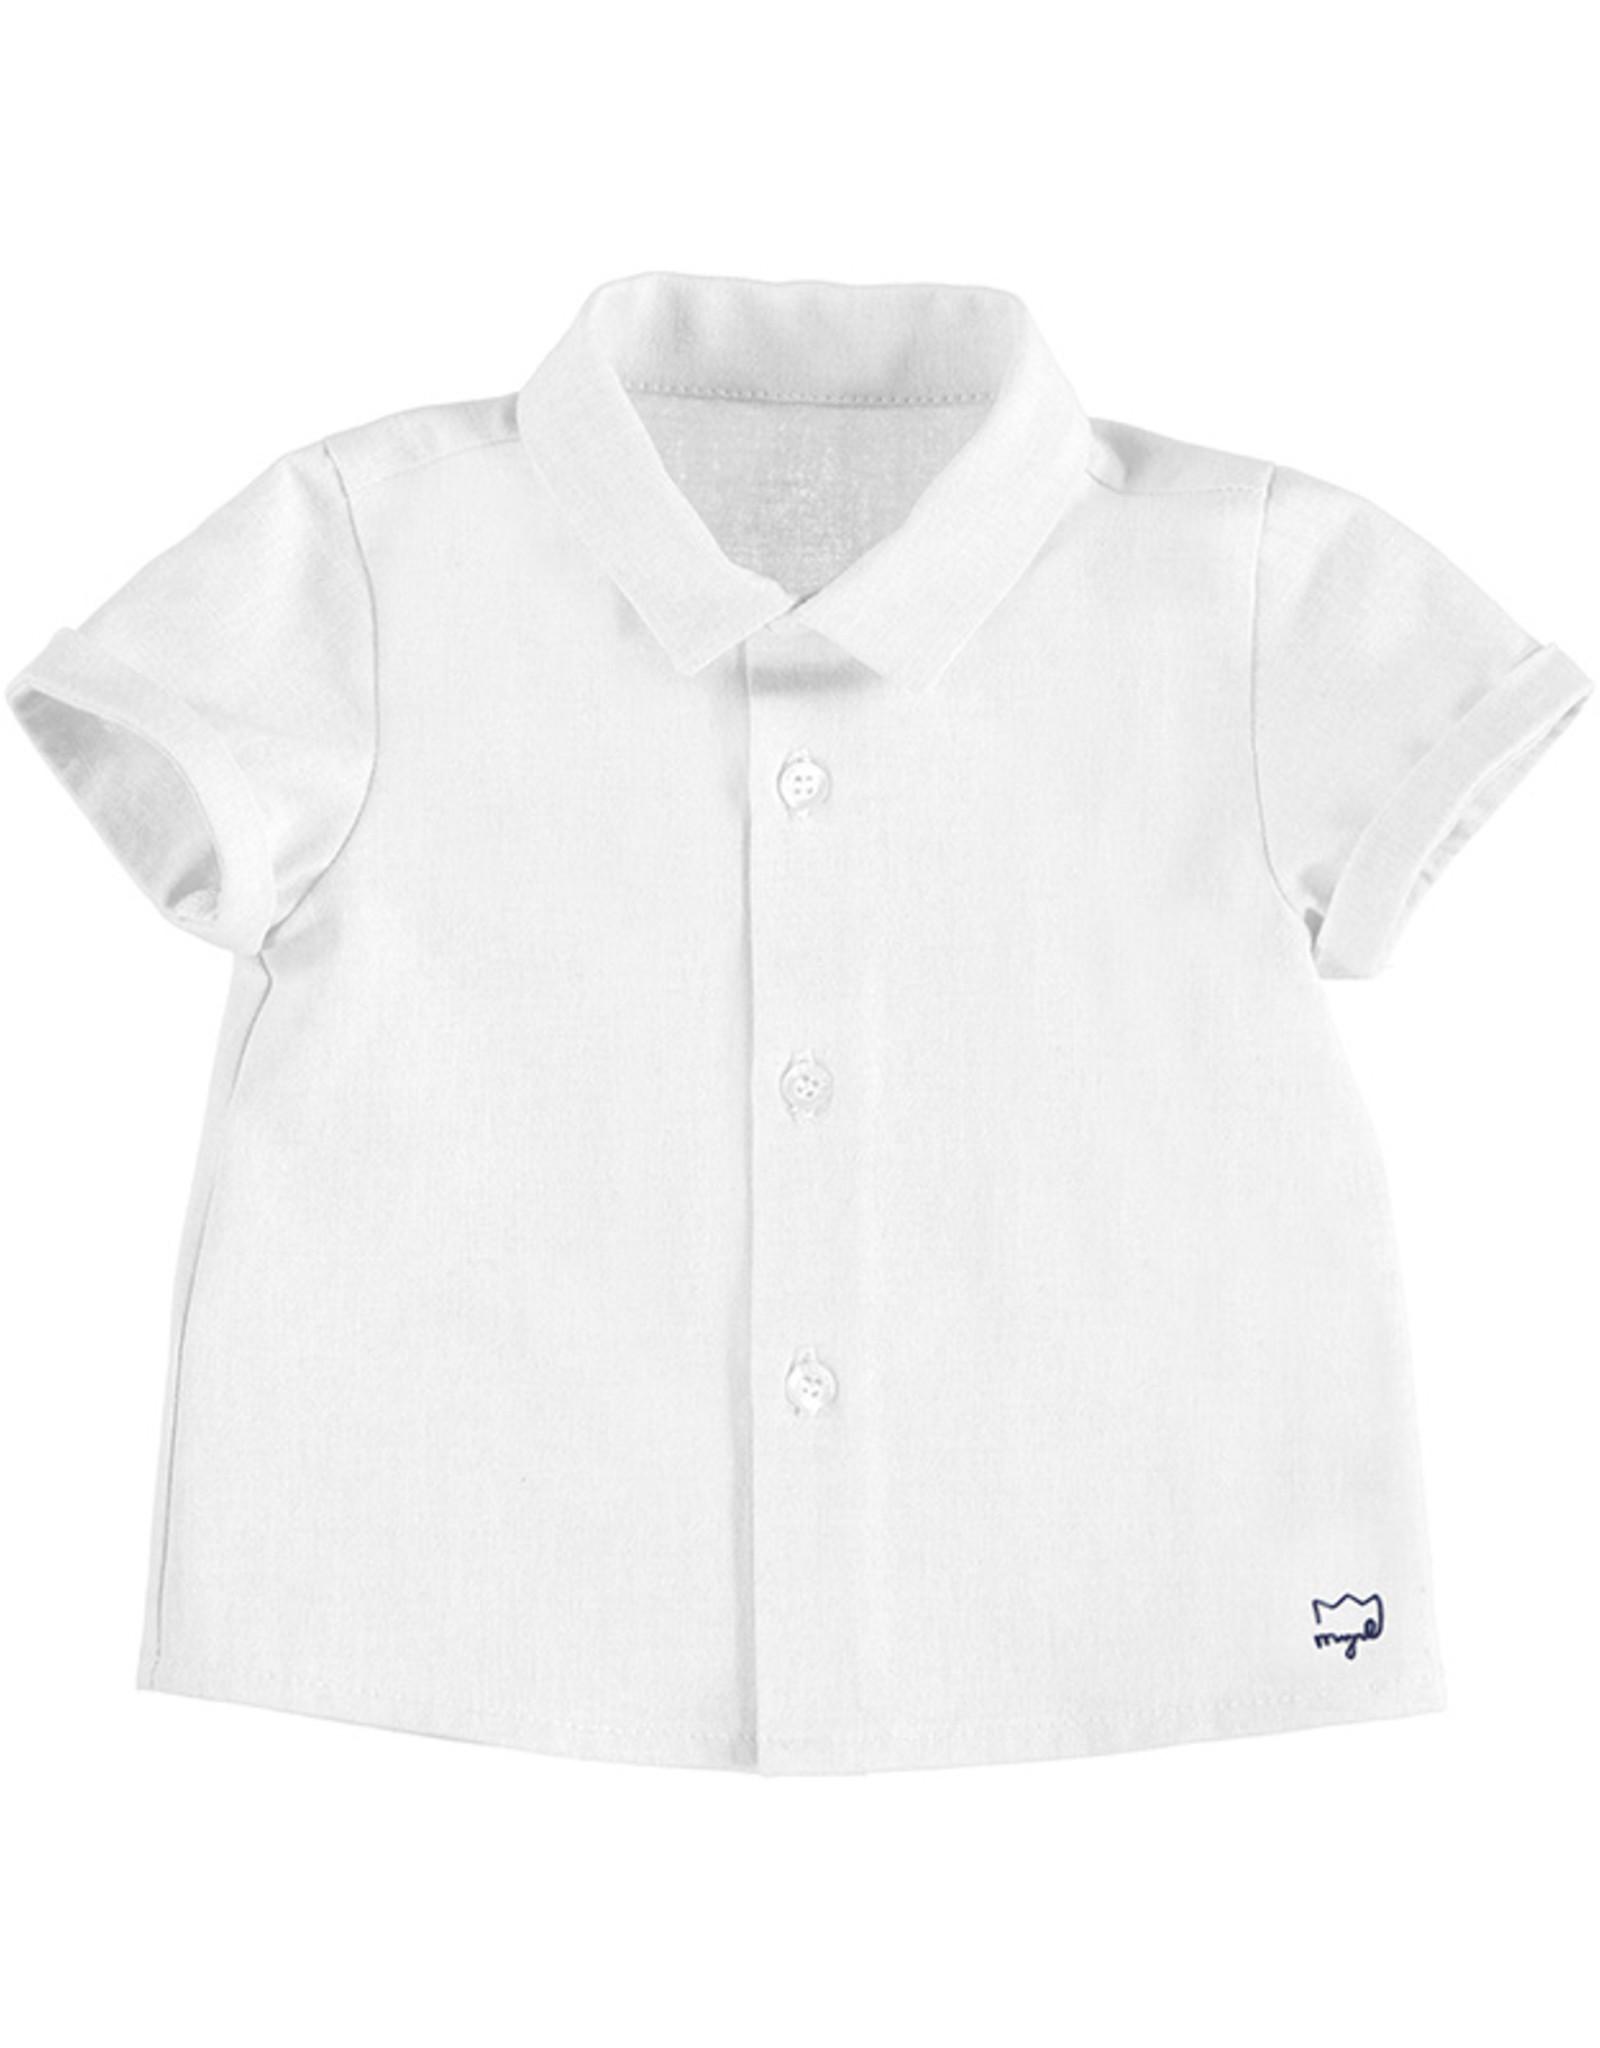 Mayoral S/S White Infant Shirt